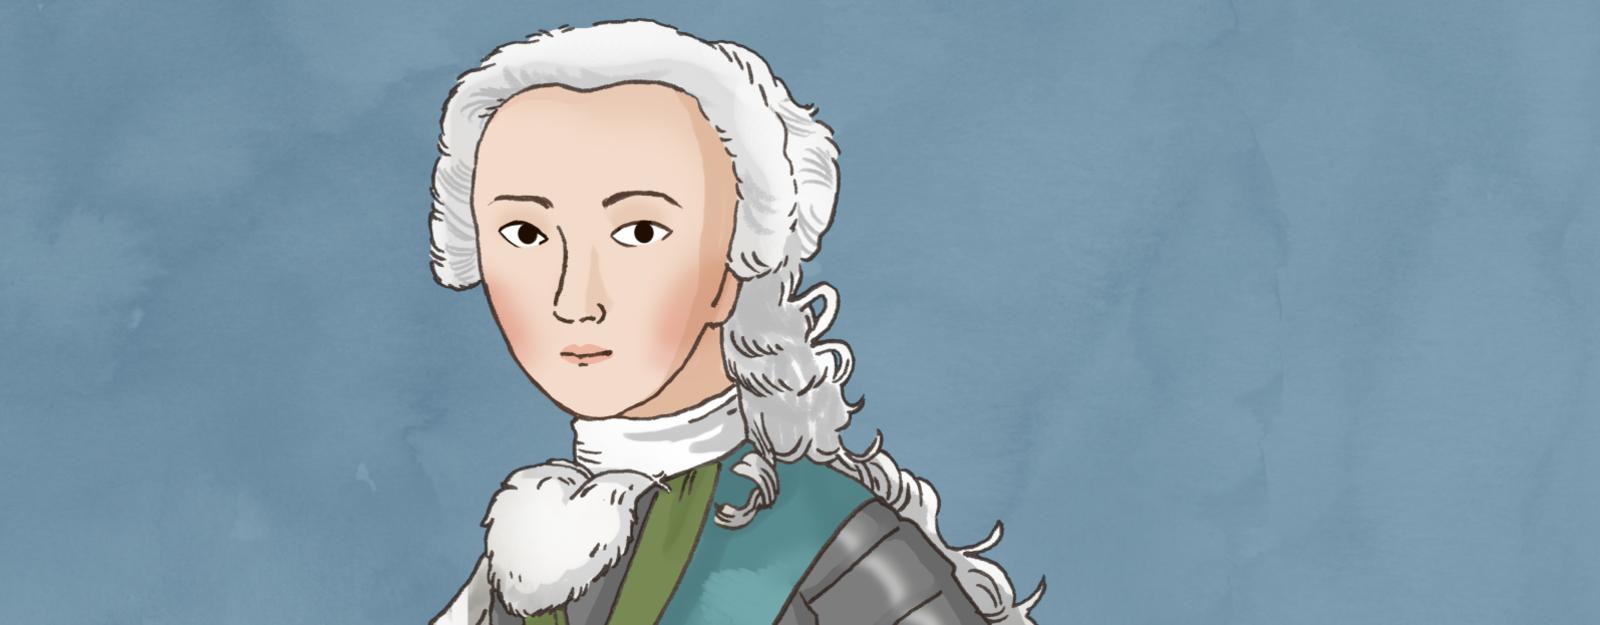 Illustration of Bonnie Prince Charlie